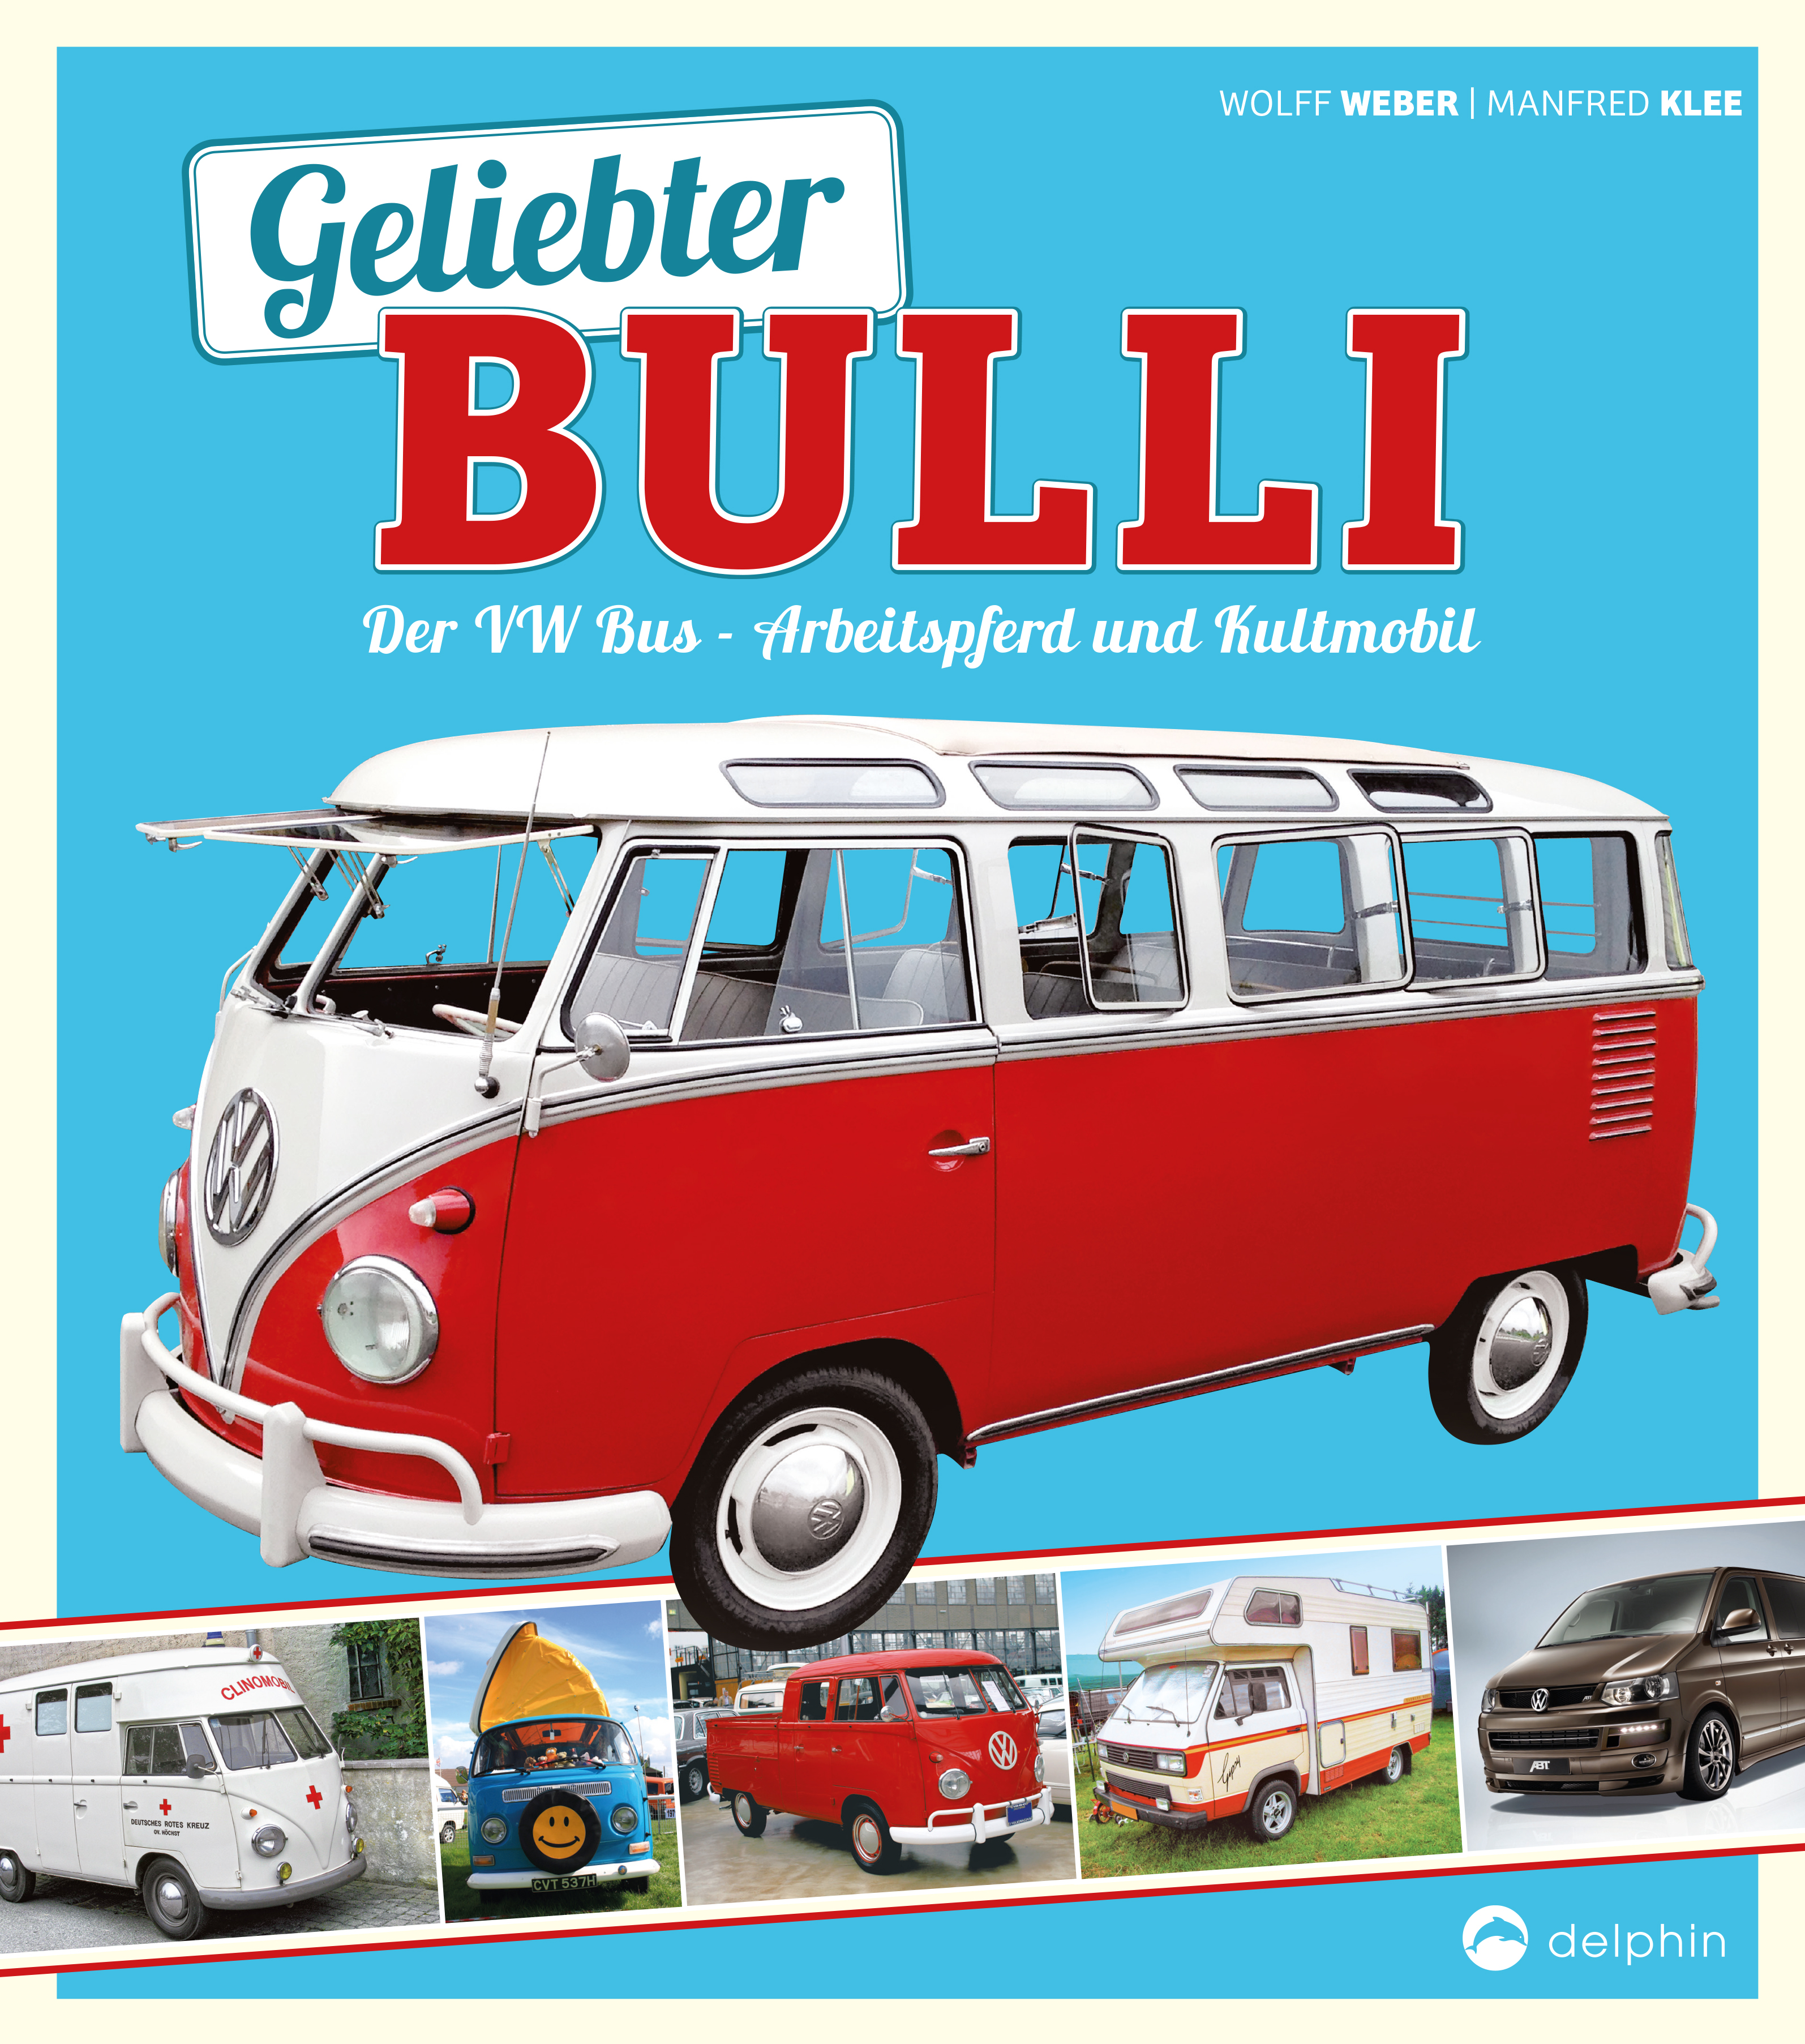 Surf Bulli VW Bus 1P Bild auf Leinwand Wandbild Poster Kunstdruck